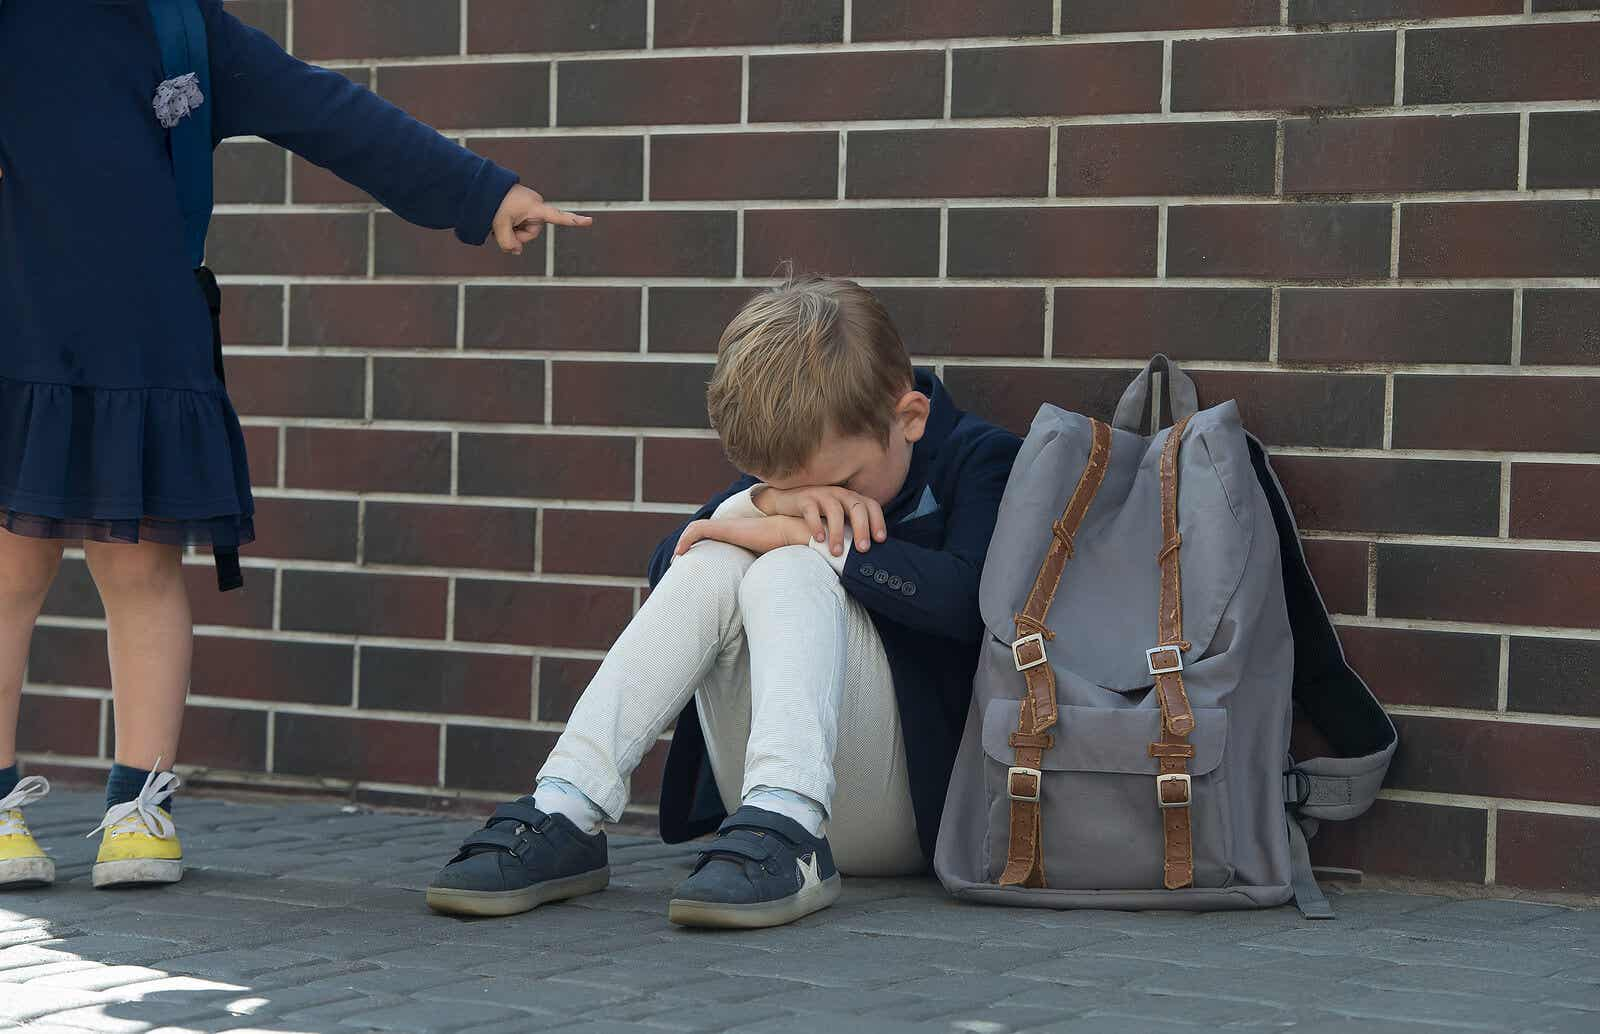 An elementary school boy suffering from bullying.